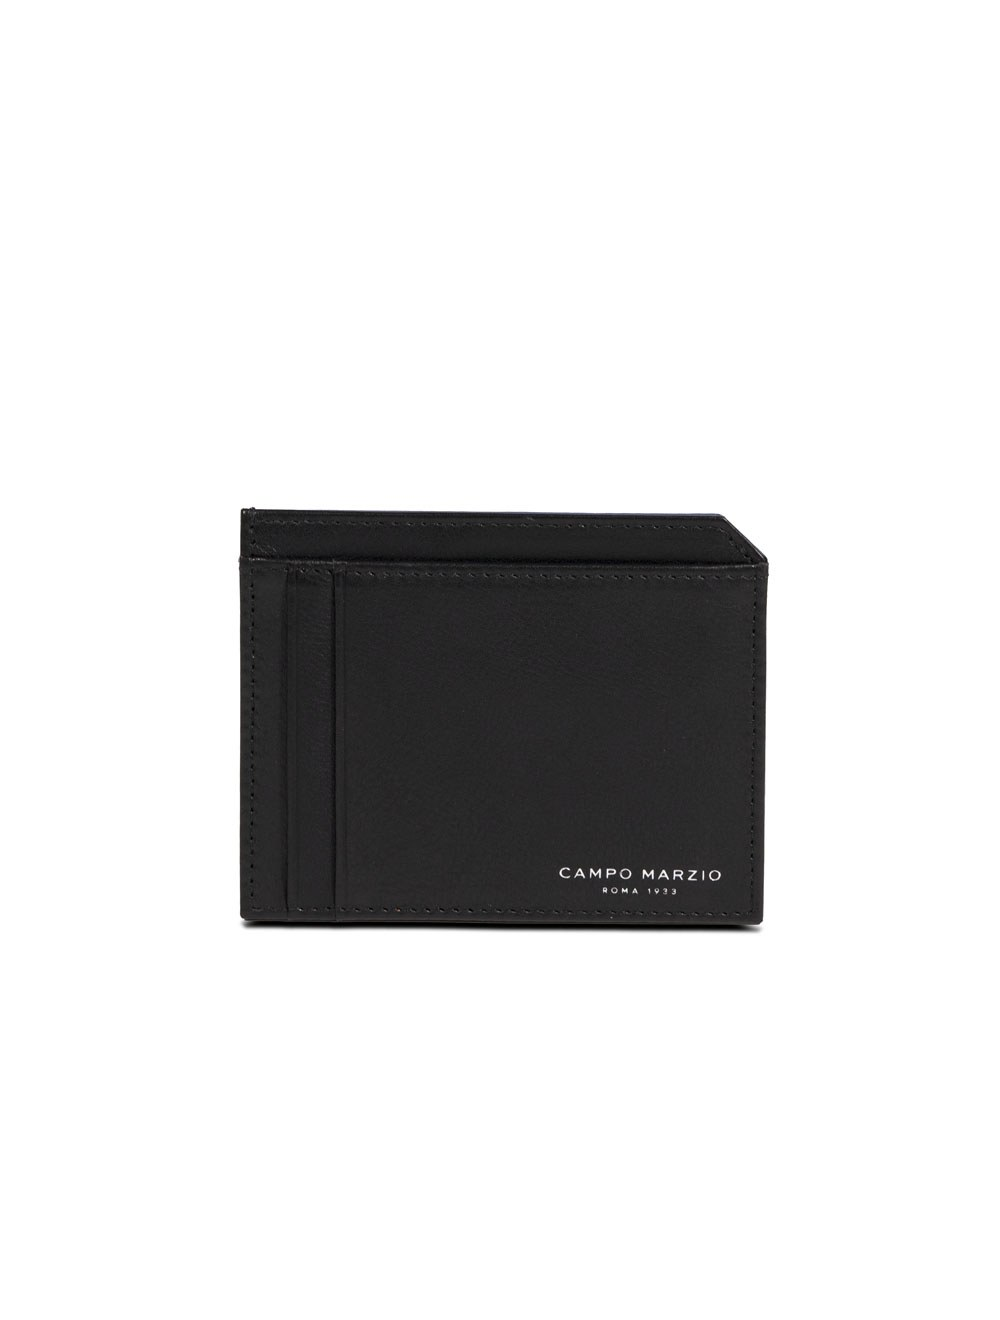 Card Holder Slim - Black